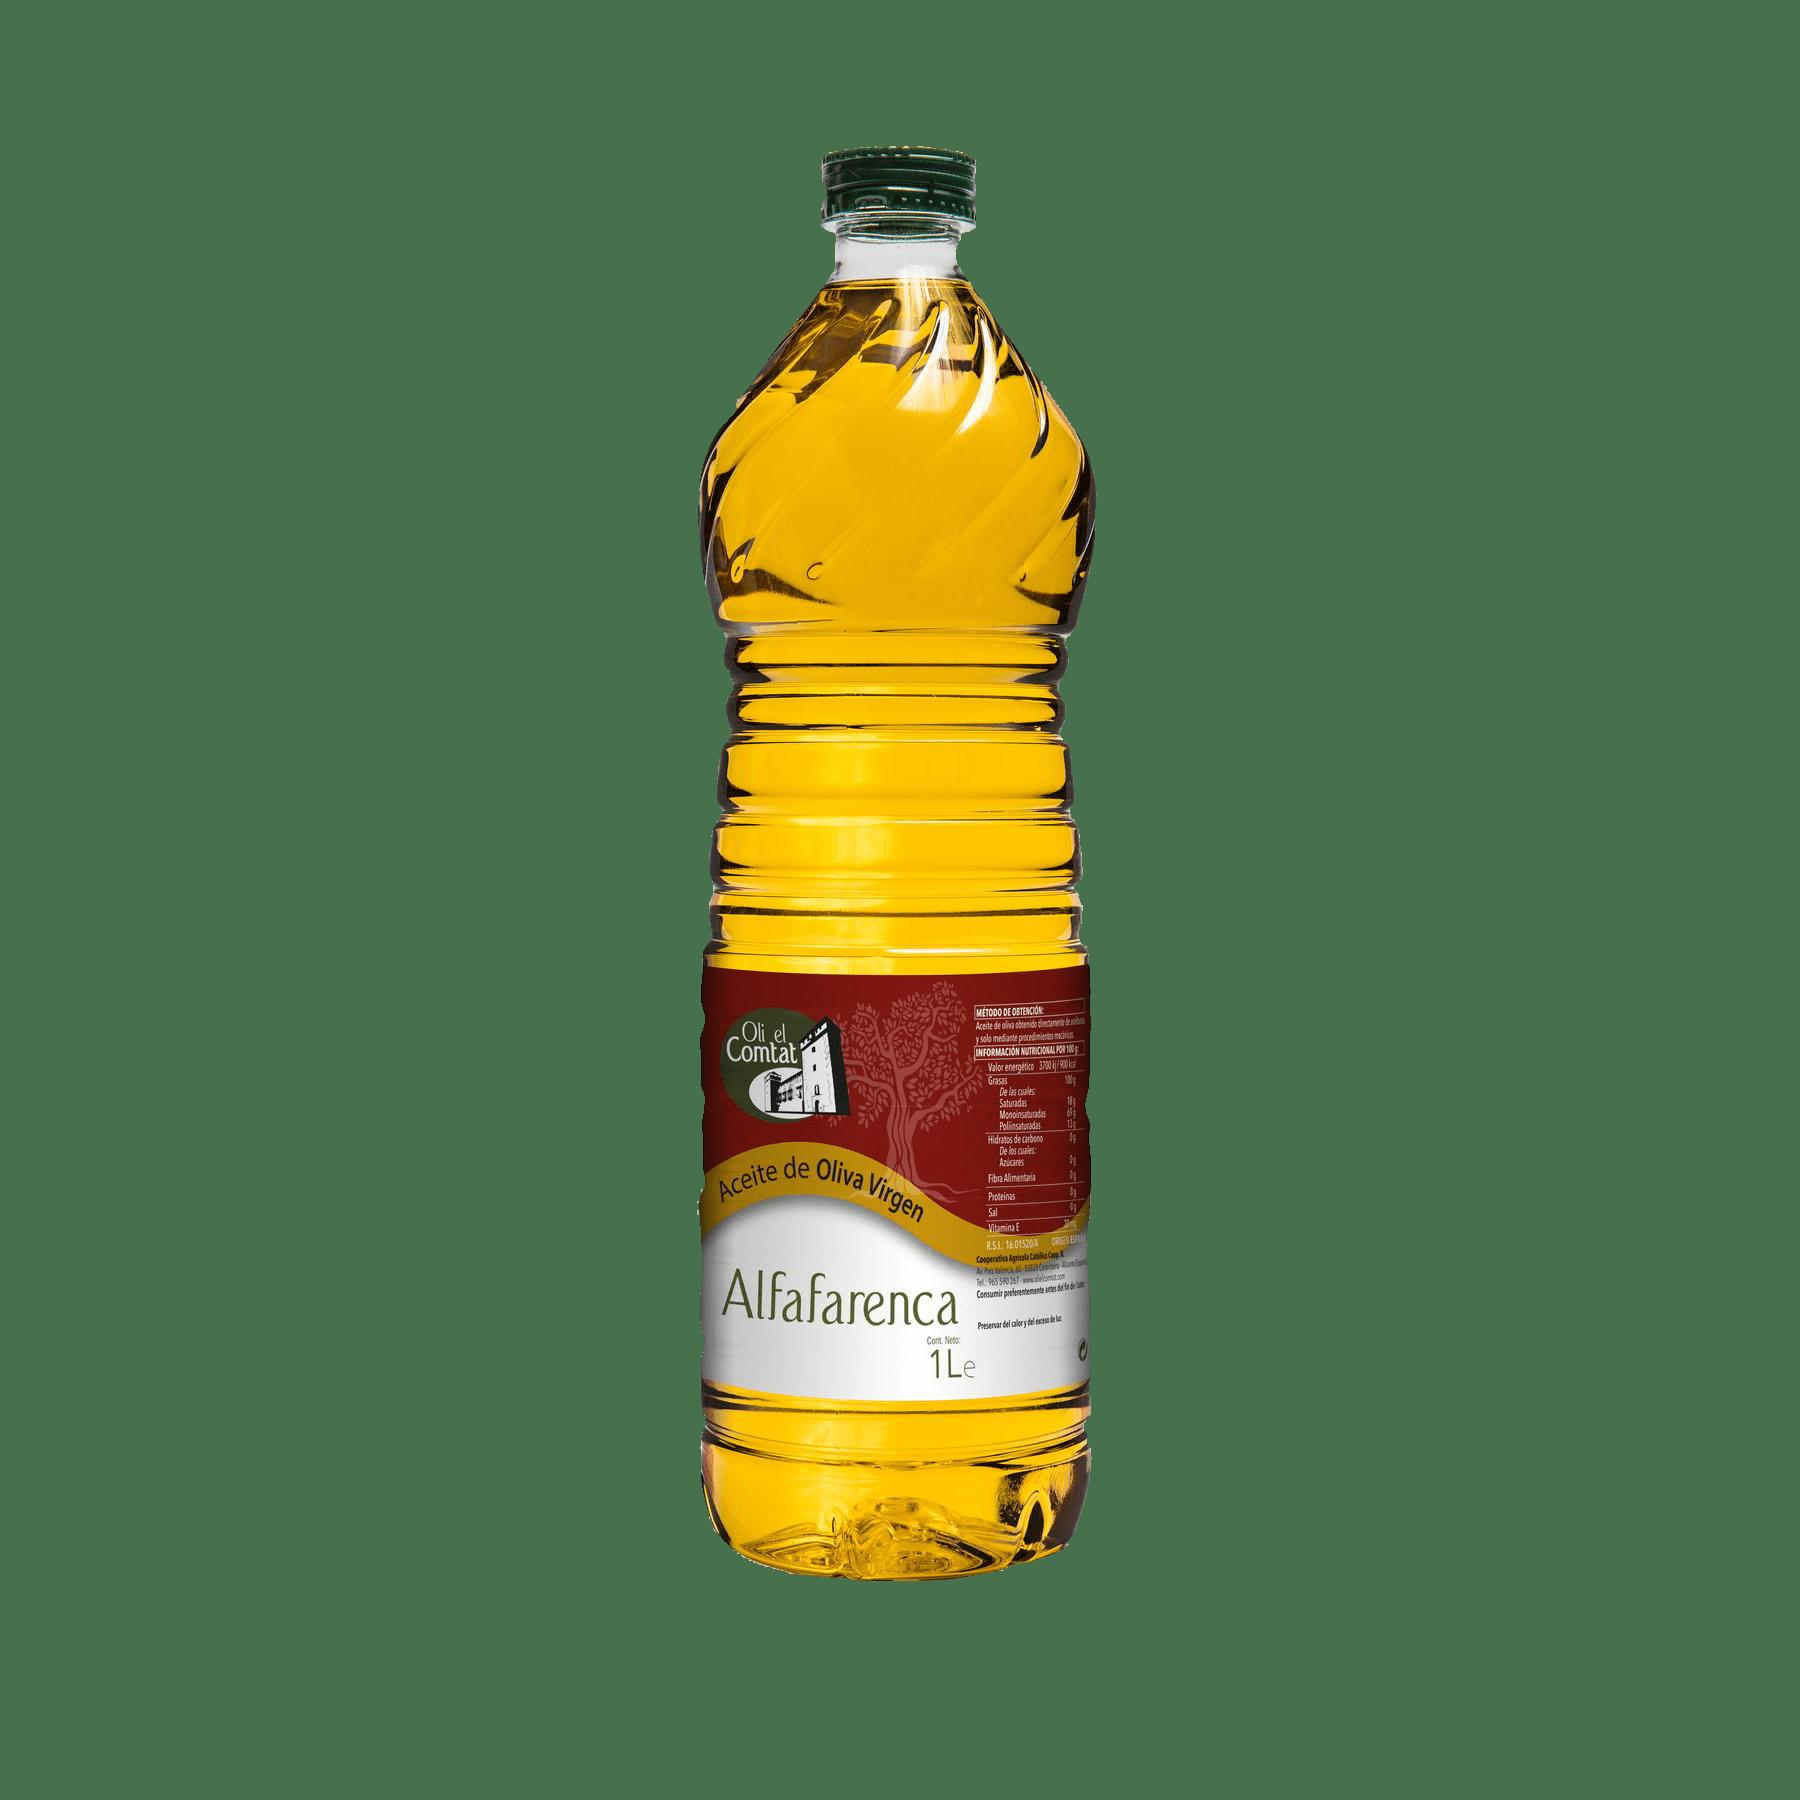 Aceite_ de_oliva_alfafarenca_1l